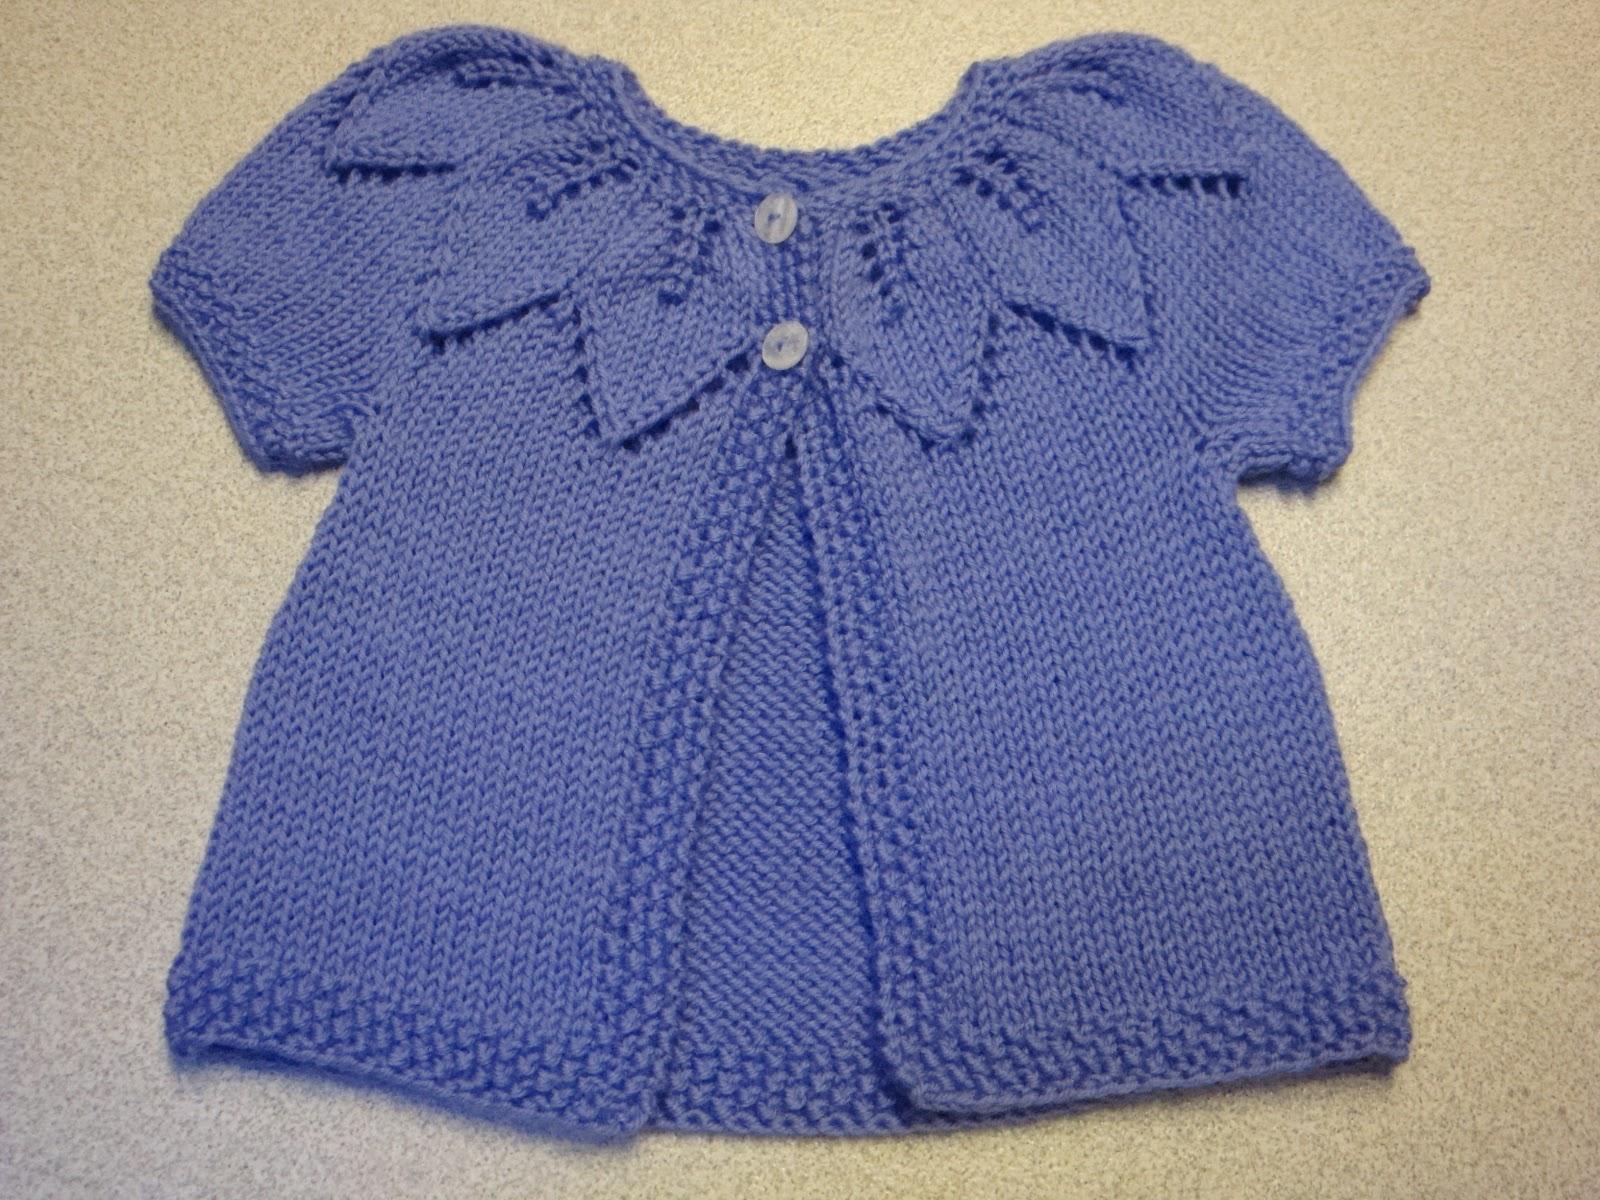 Knit Leaf Pattern Baby Sweater : Kims Knitting Korner: Lavender Leaves: A sweet sweater ...